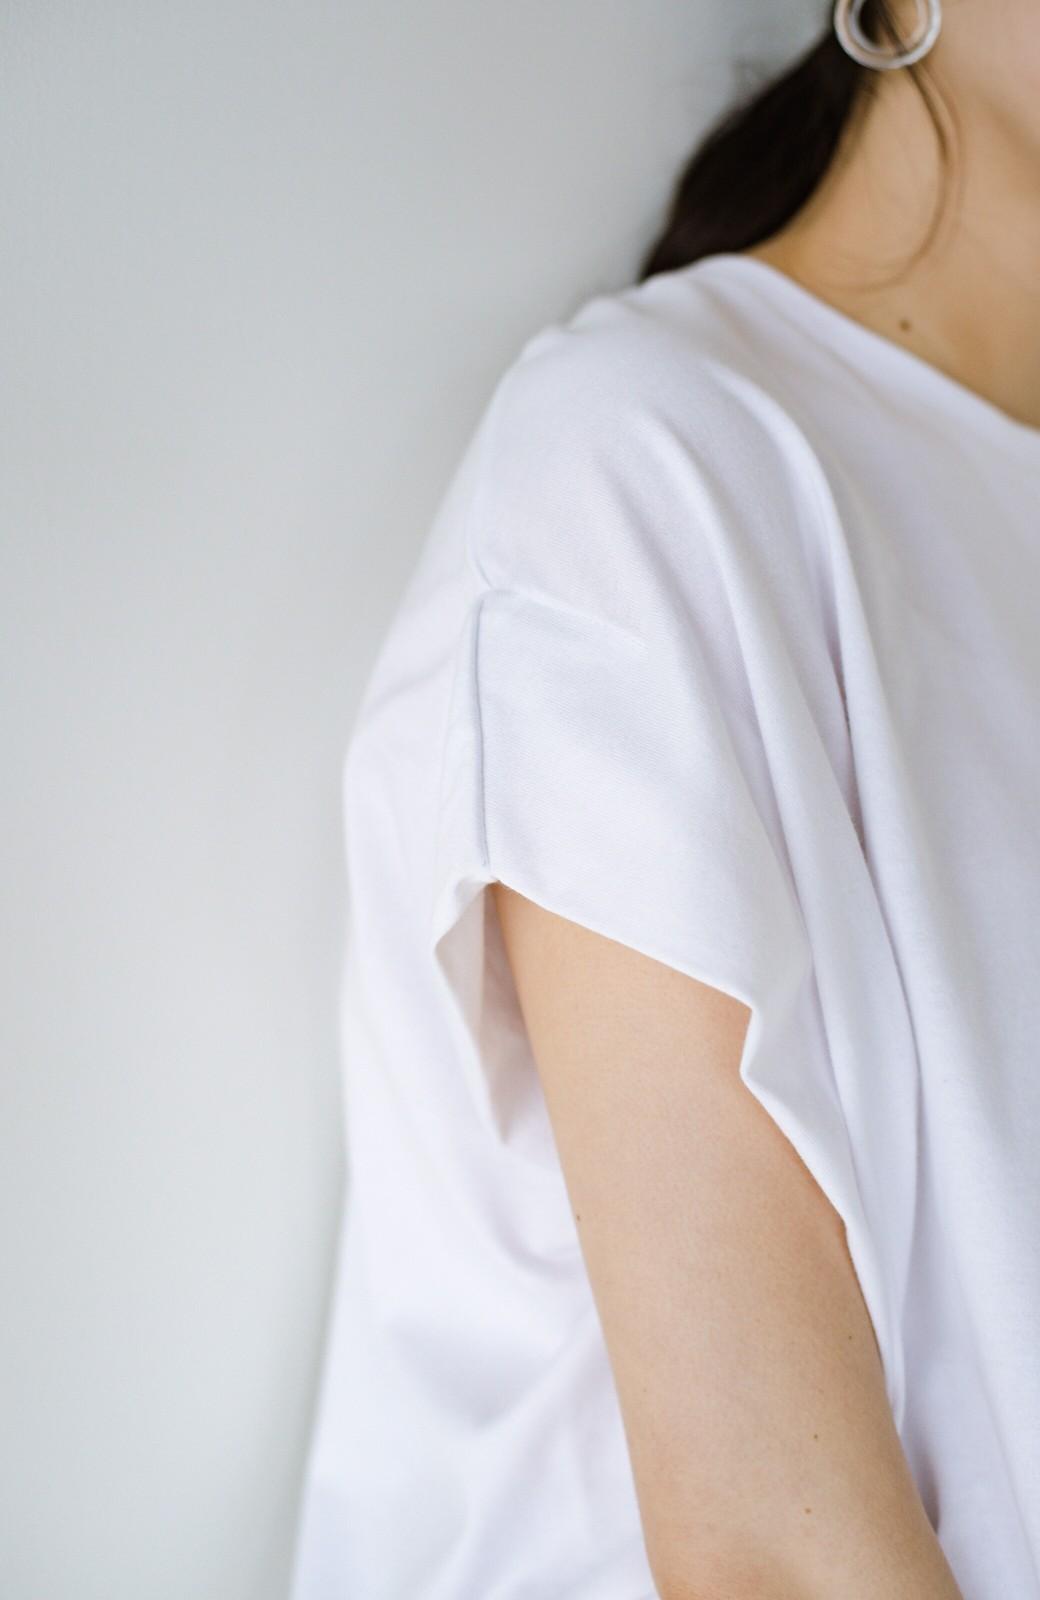 haco! PBPオーガニックコットン 楽ちんなのにブラウス気分で着られる大人のおめかしTシャツ <ホワイト>の商品写真5